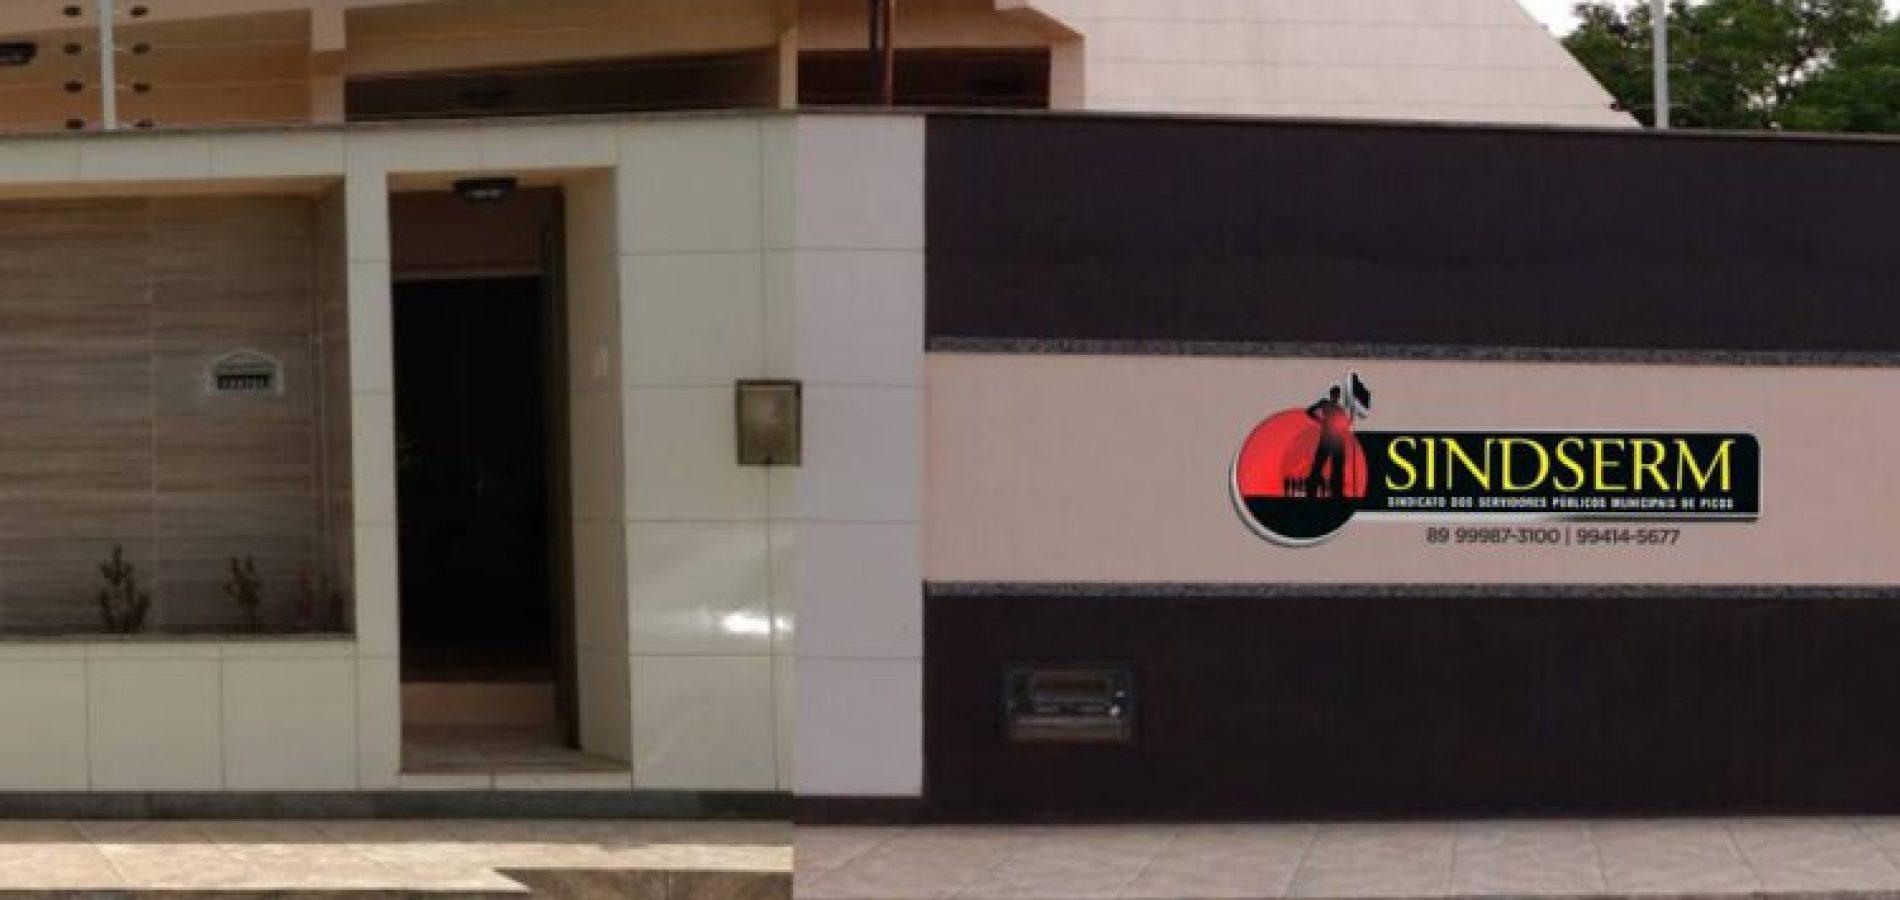 Sindicato propõe reajuste salarial para os servidores públicos da Prefeitura de Picos